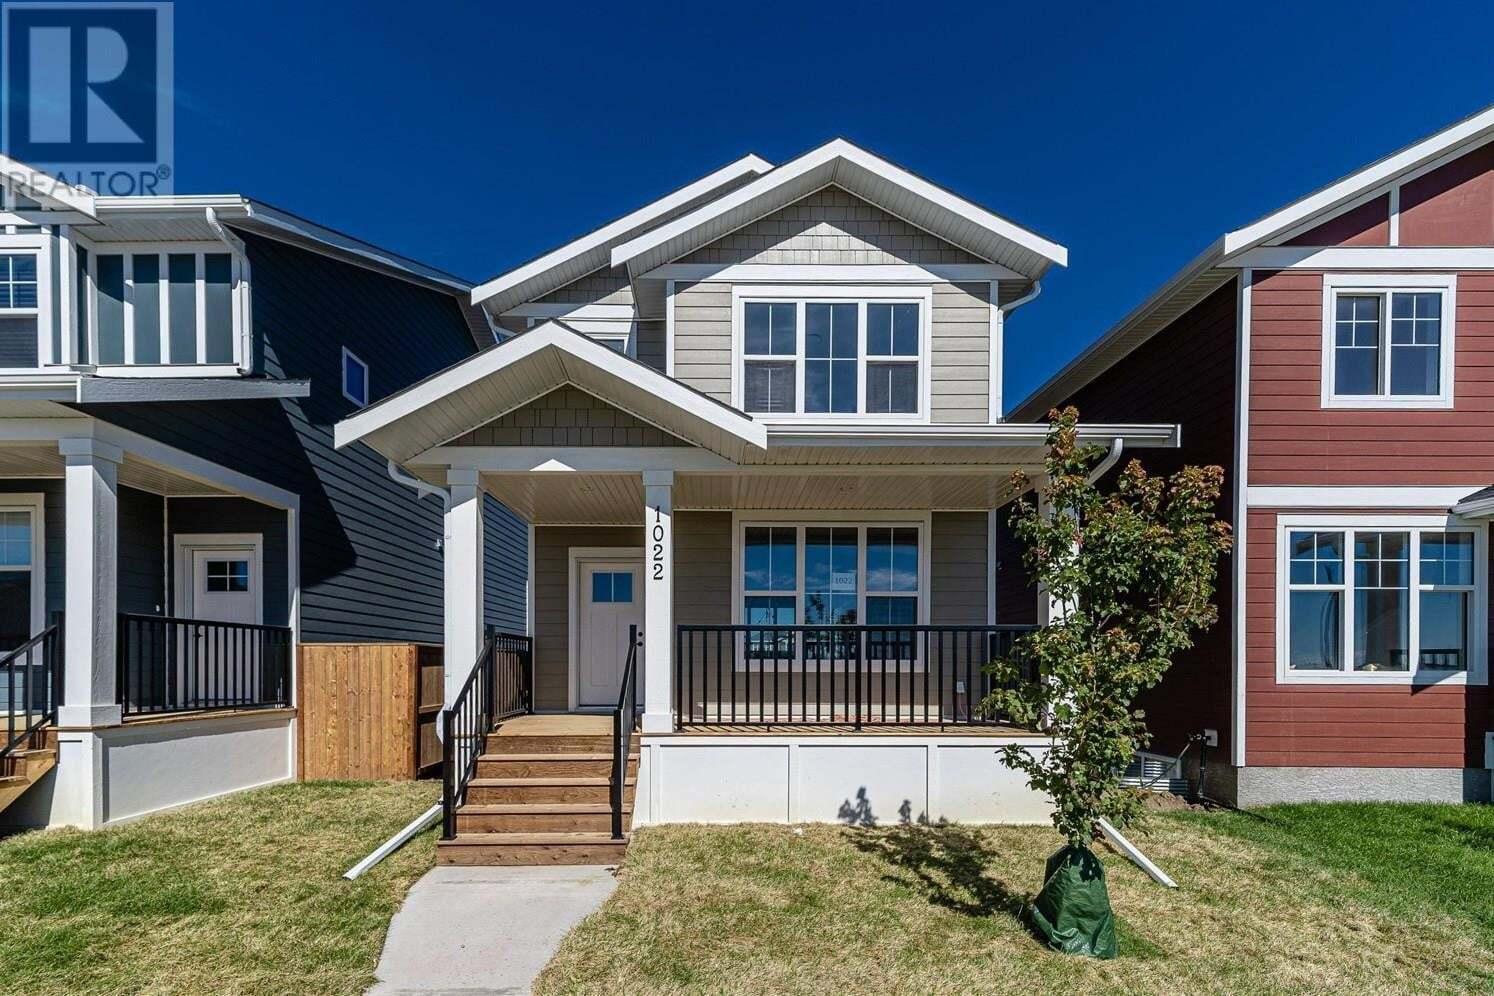 House for sale at 1022 Stilling St Saskatoon Saskatchewan - MLS: SK828149